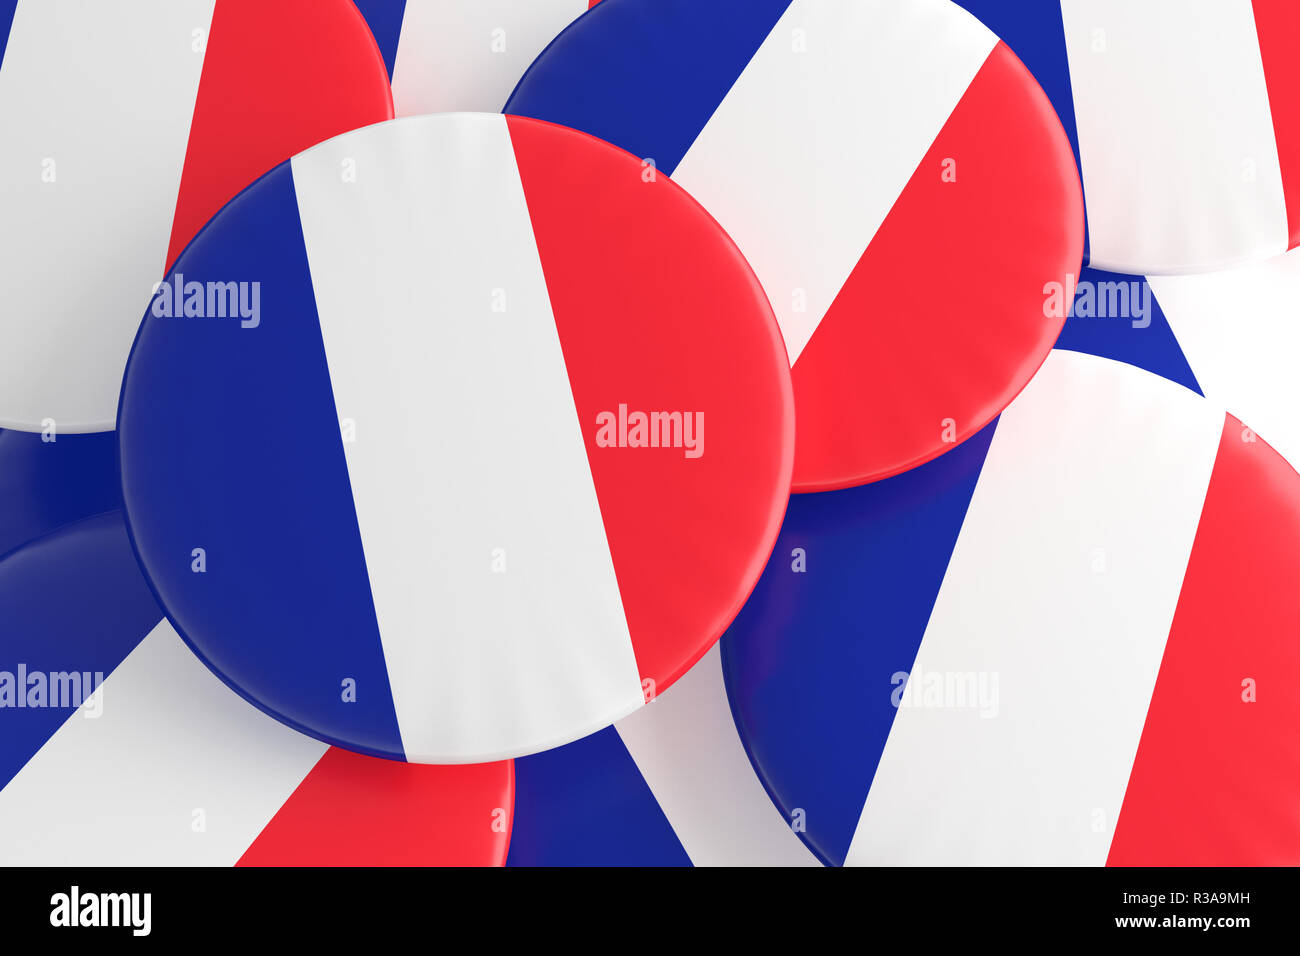 French Tricolor: Pile of France Flag Badges, 3d illustration - Stock Image